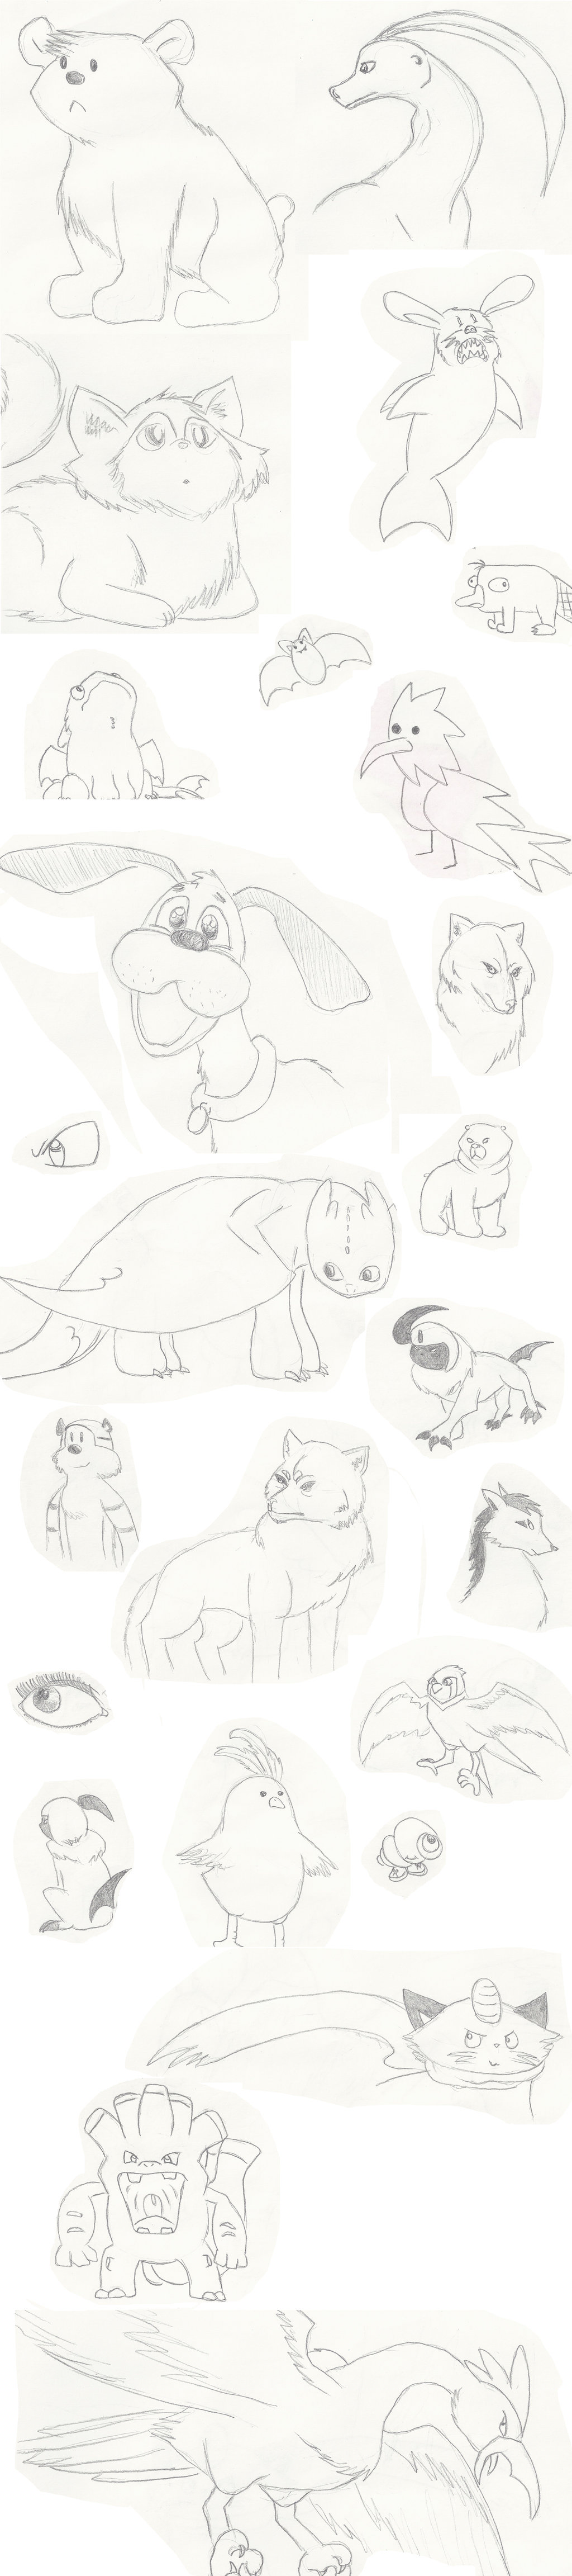 Sketchdump of Randomness! by GECKO-Nuzlockes